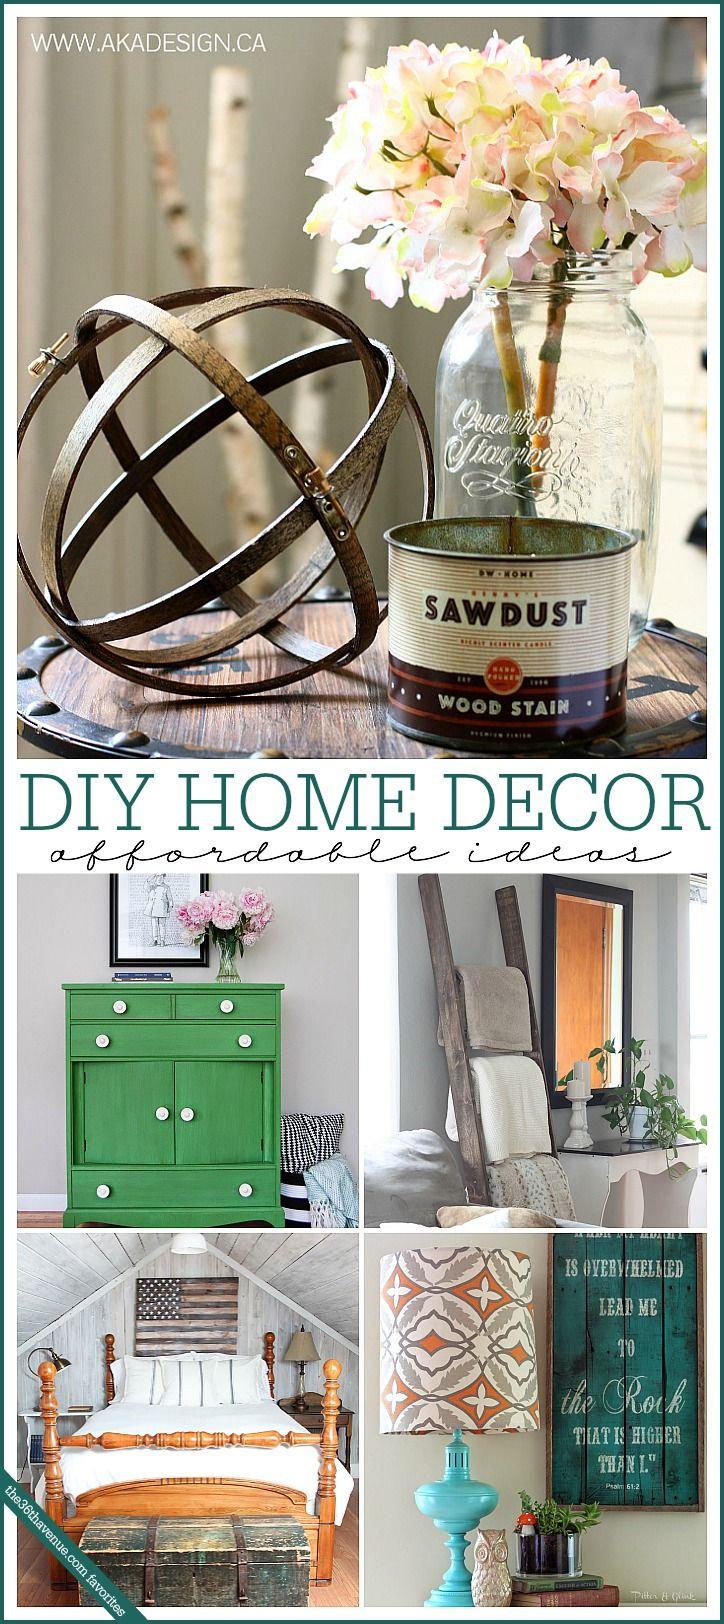 Home Decor DIY Ideas at the36thavenuecom So many cute and